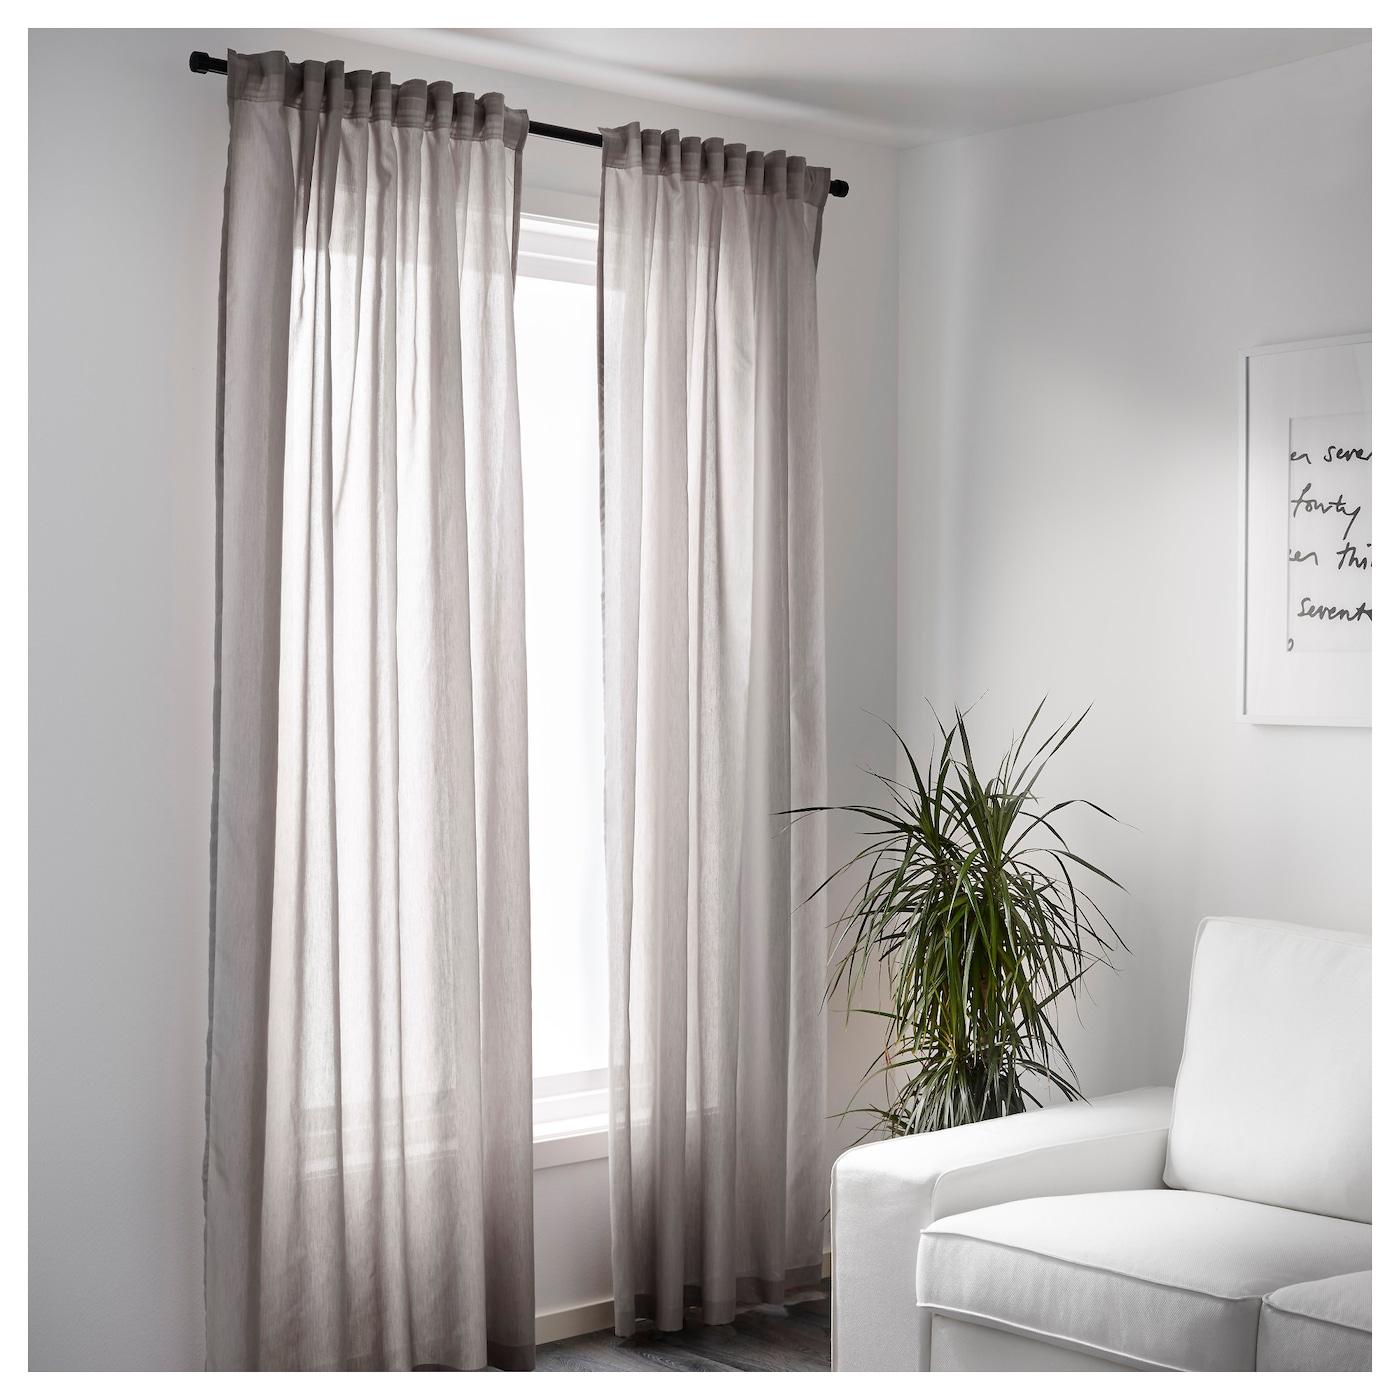 Vivan Curtains 1 Pair Grey 145x250 Cm Ikea